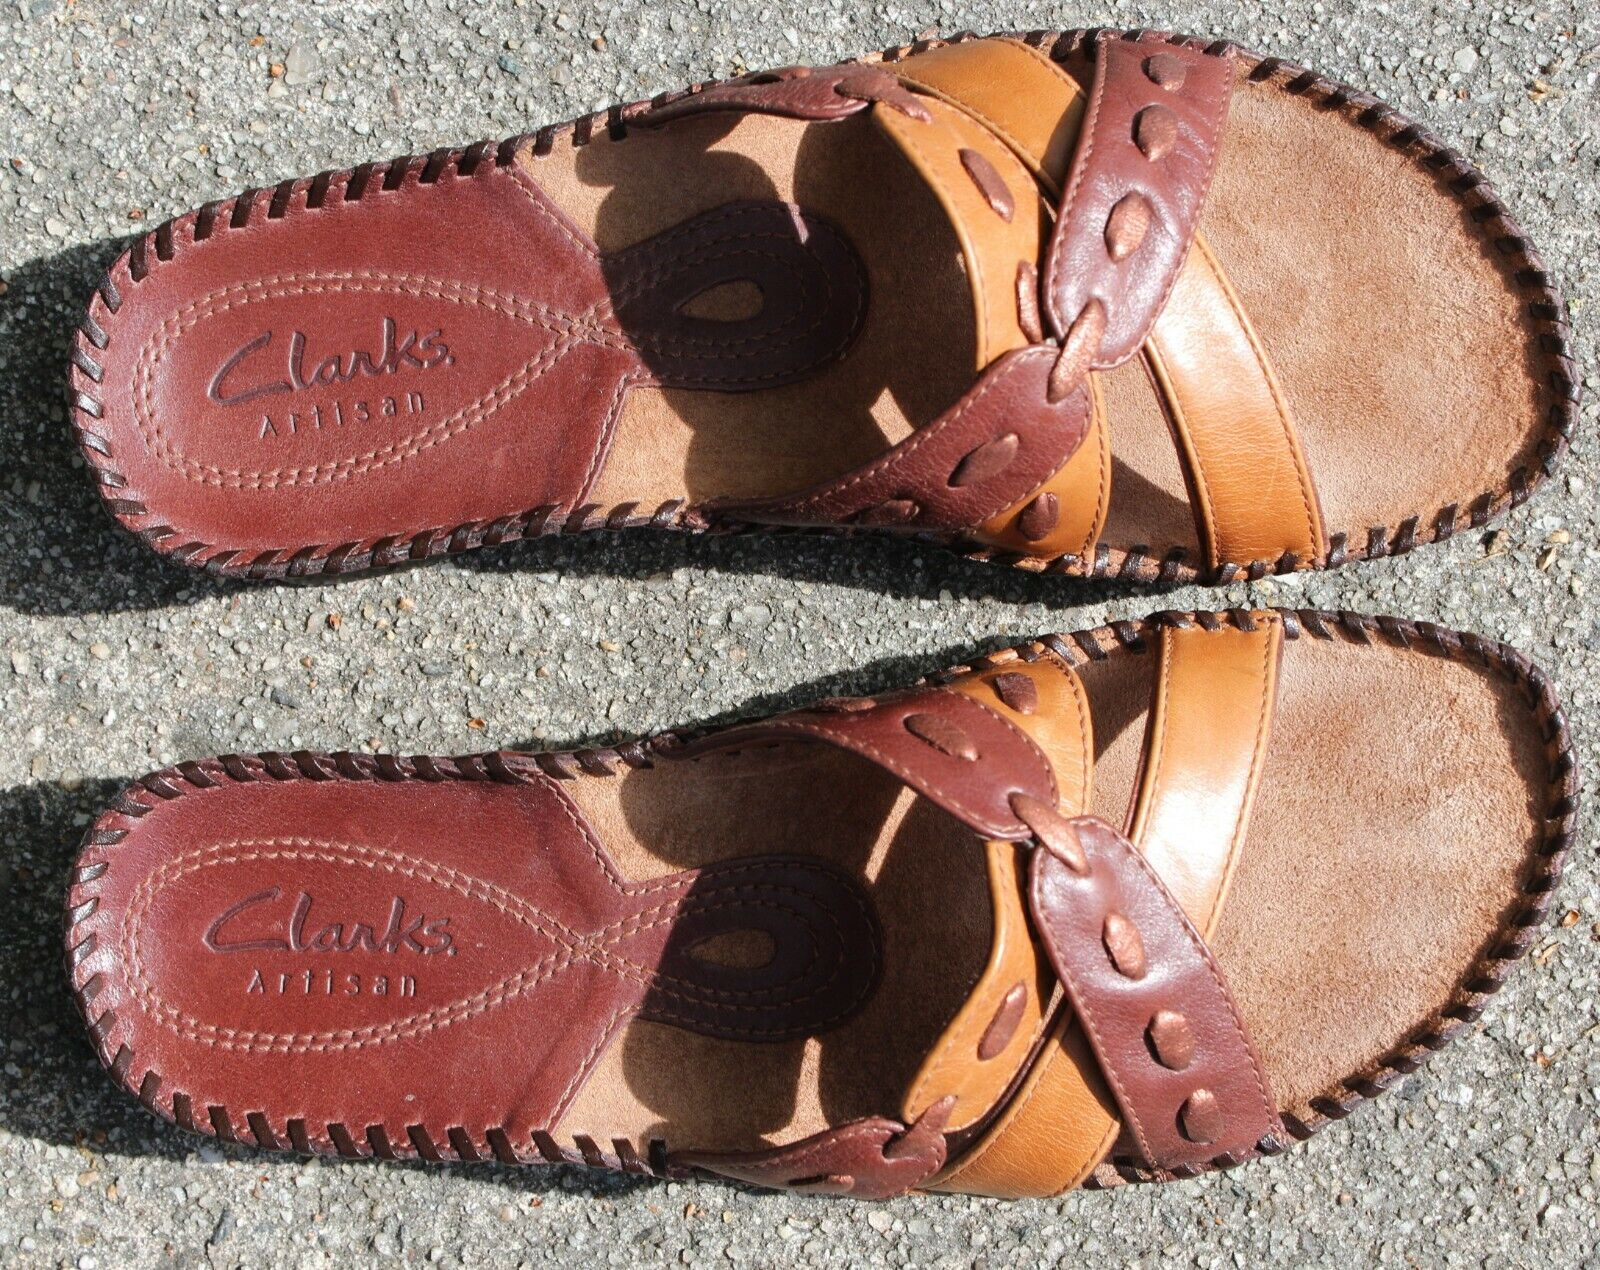 Clarks LEISA BROACH Womens White Leather 18222 3-Adjustable Straps Slide Sandals